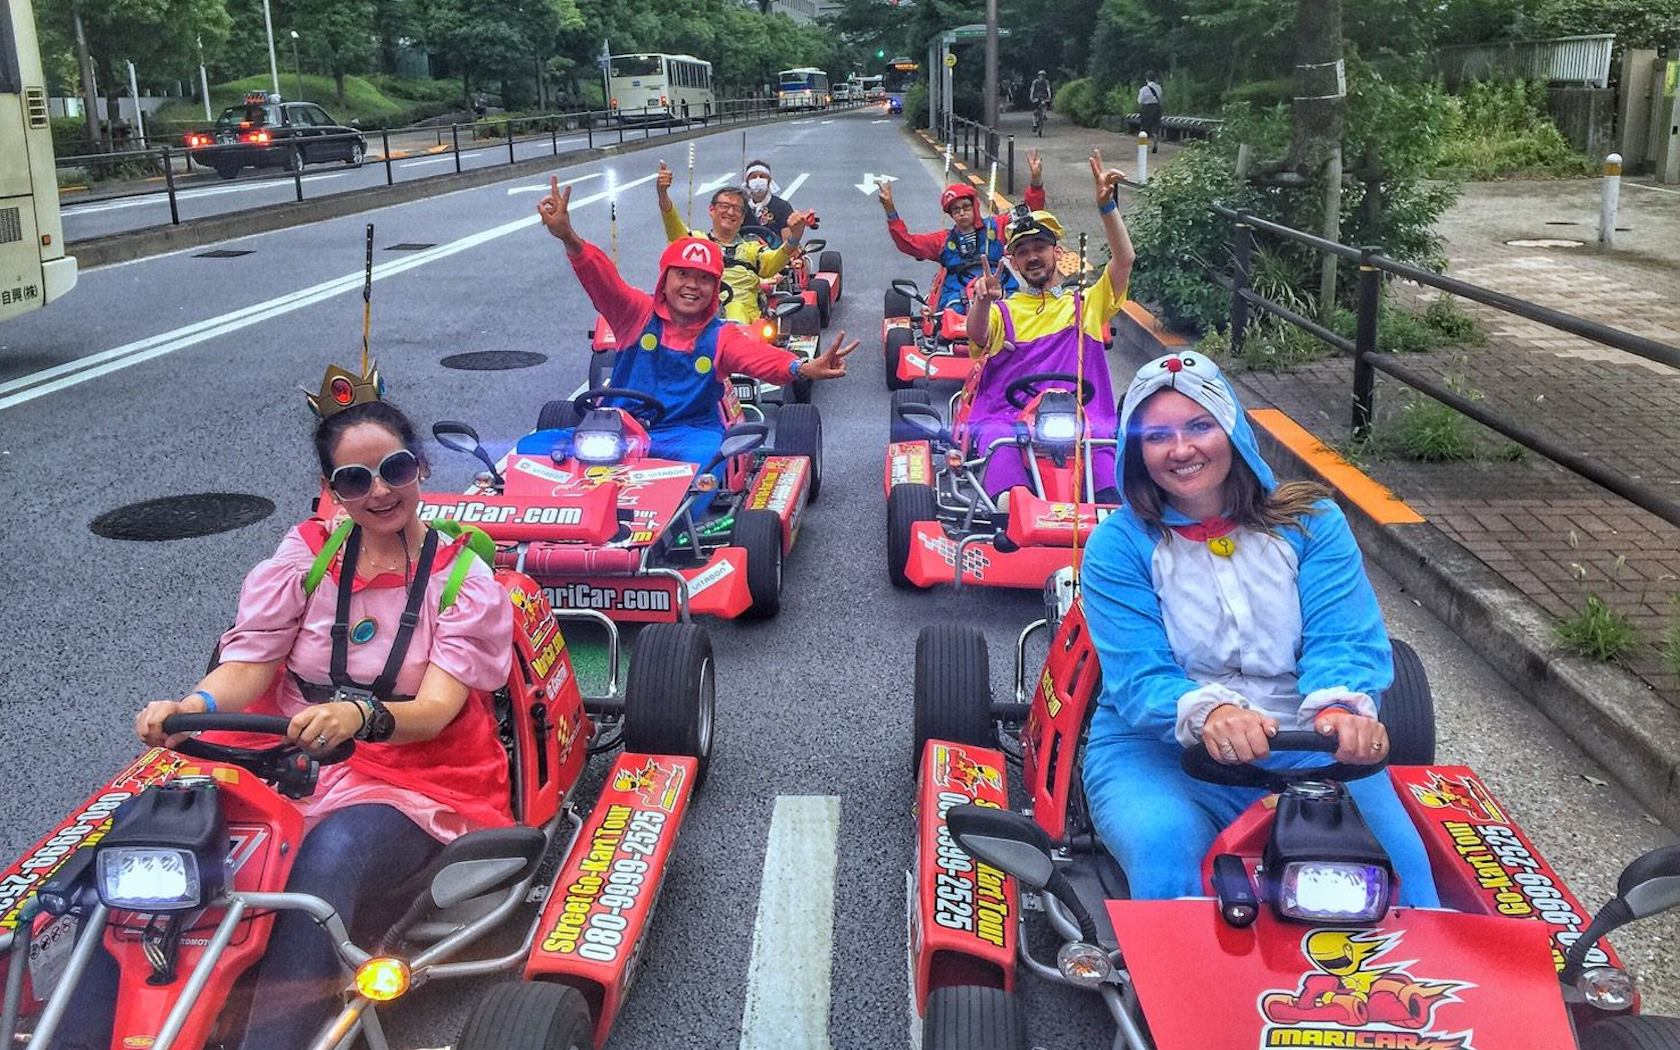 australia kart Tickets For Australia's Real Life 'Mario Kart' Are On Sale Now